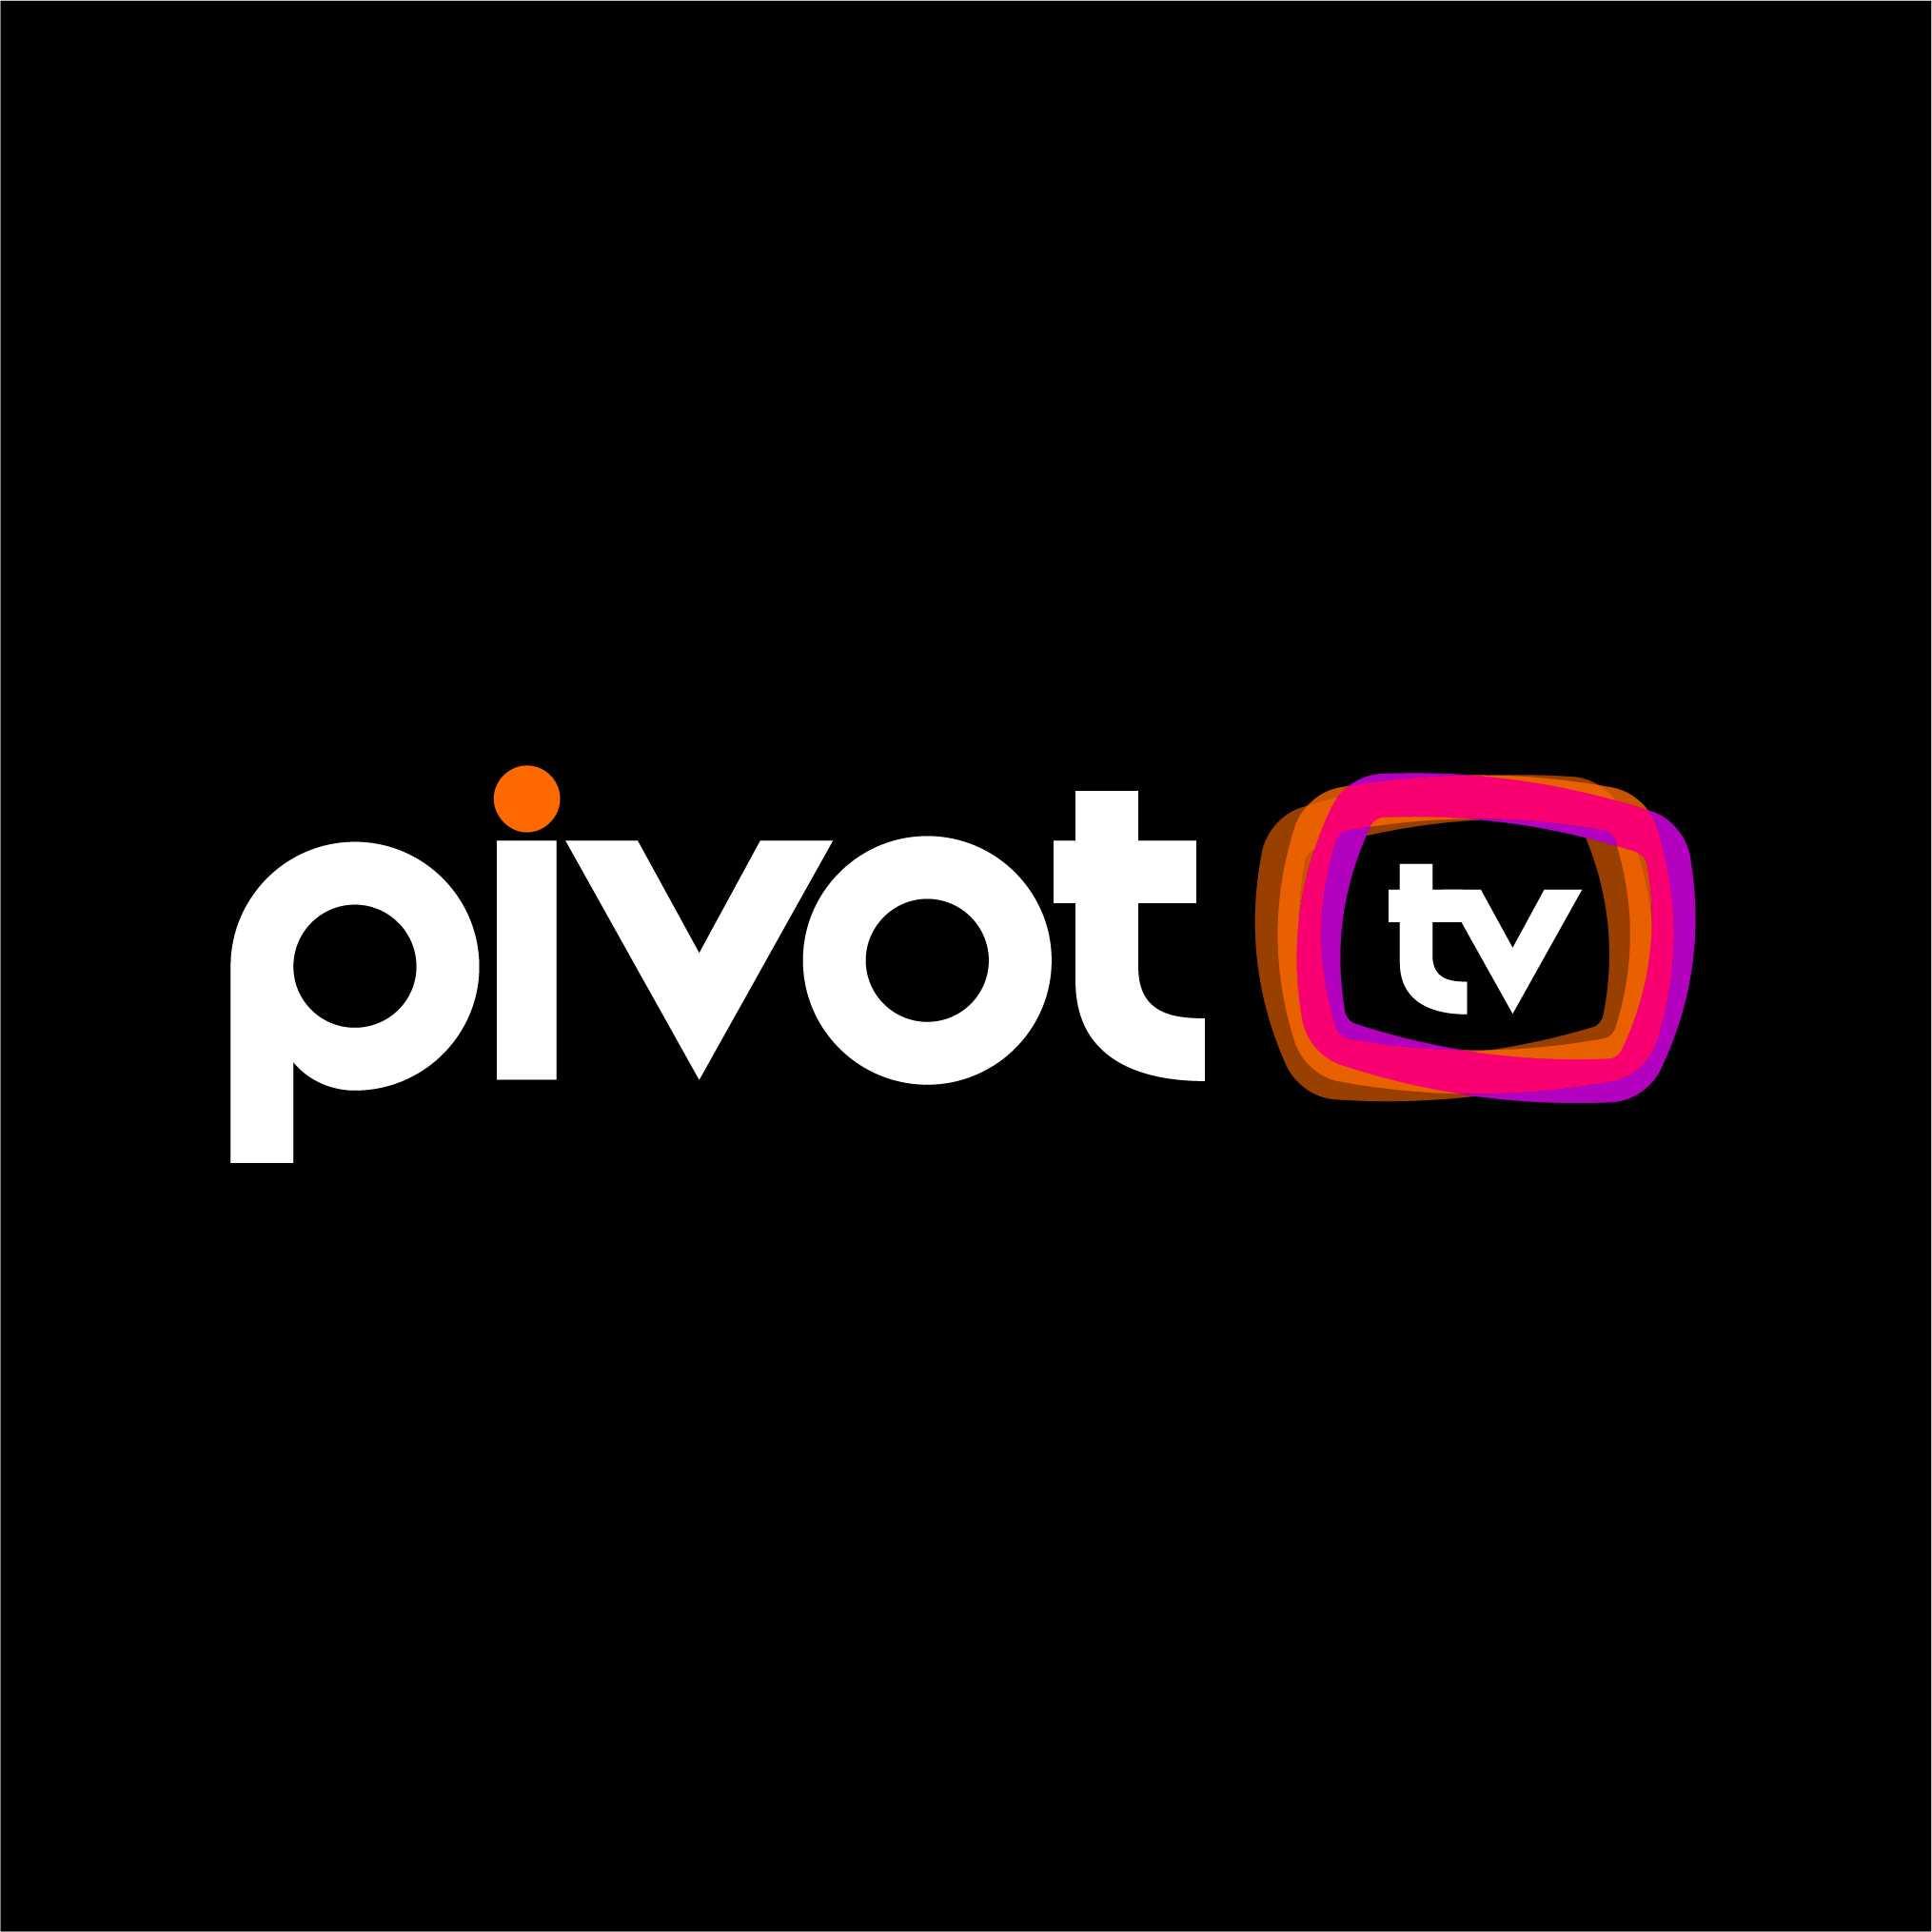 Pivot TV